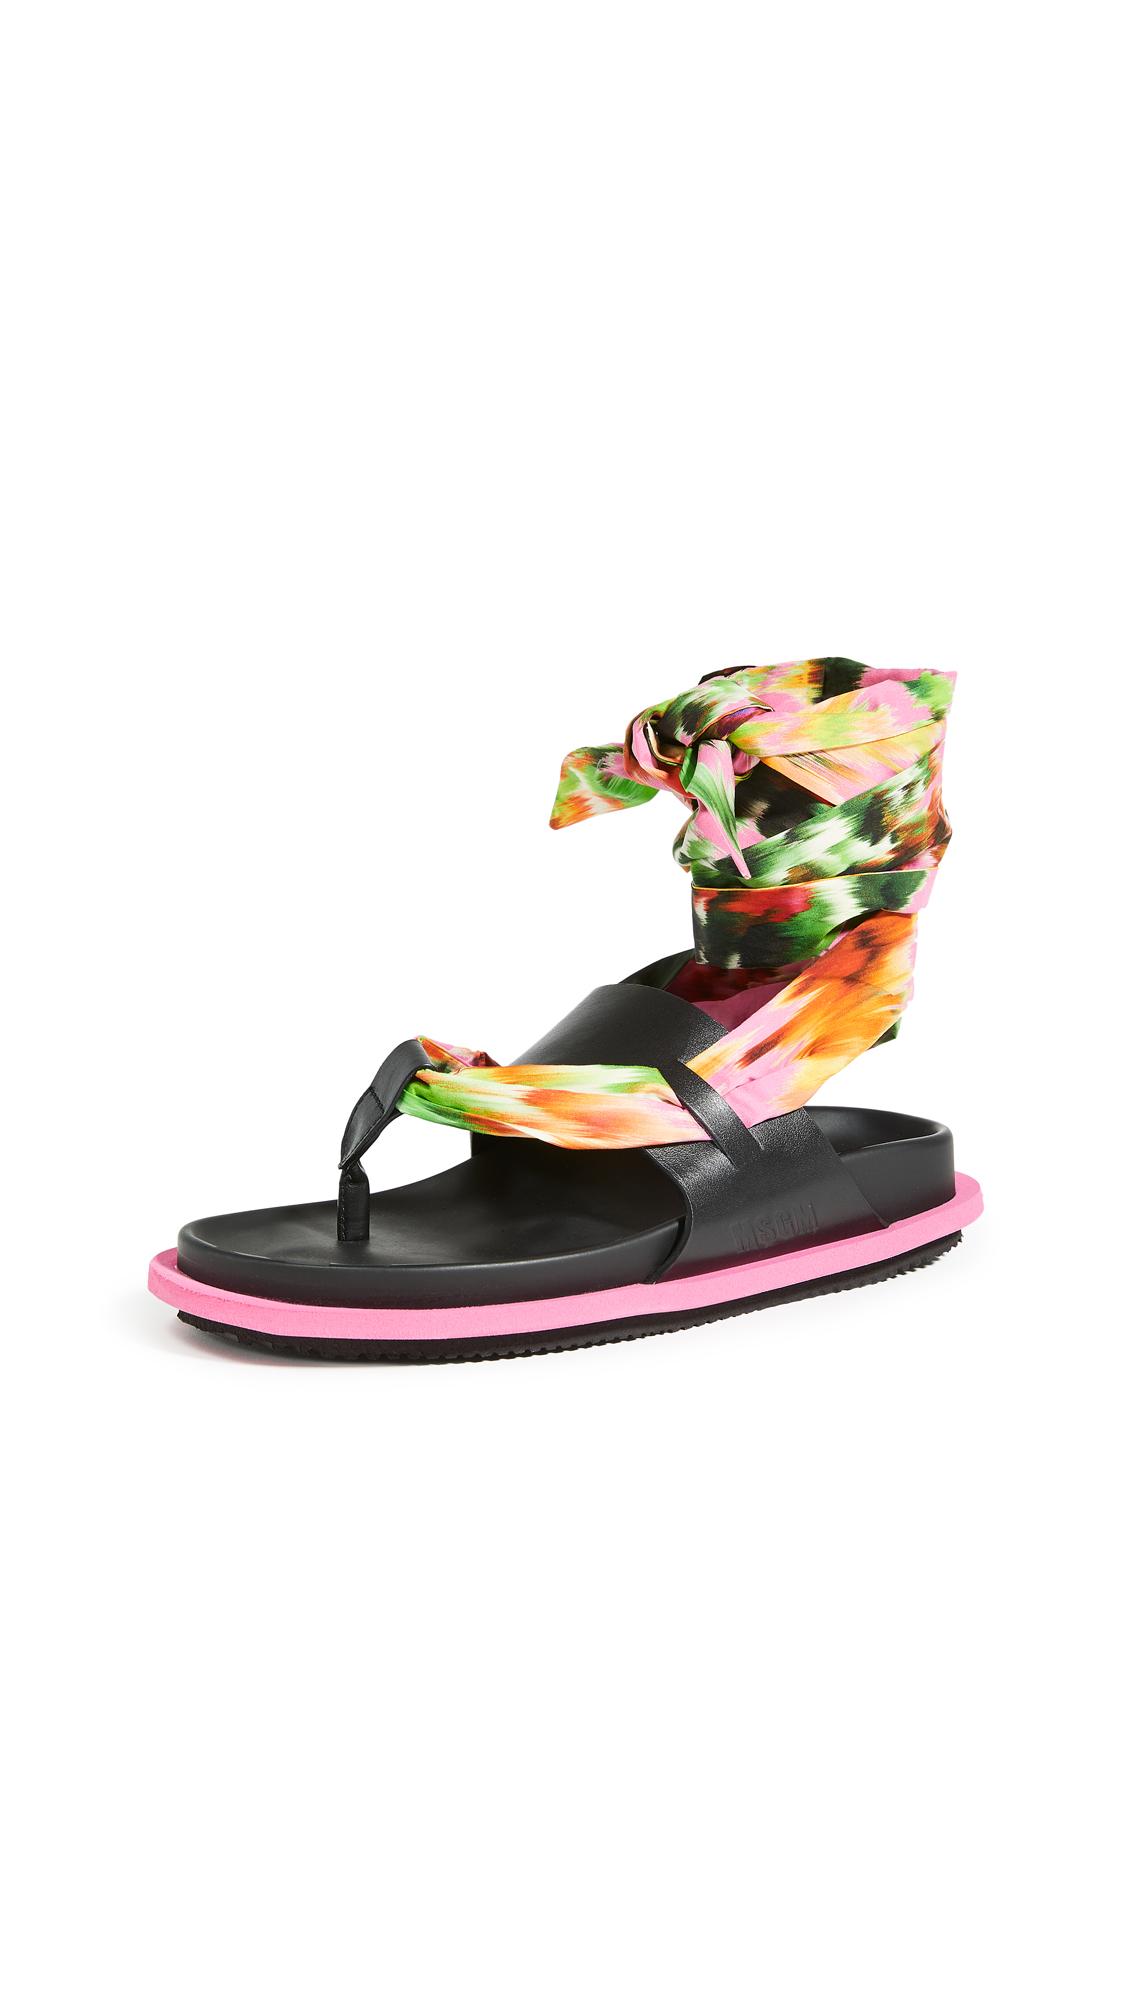 MSGM Scarf Flip Flops – 40% Off Sale